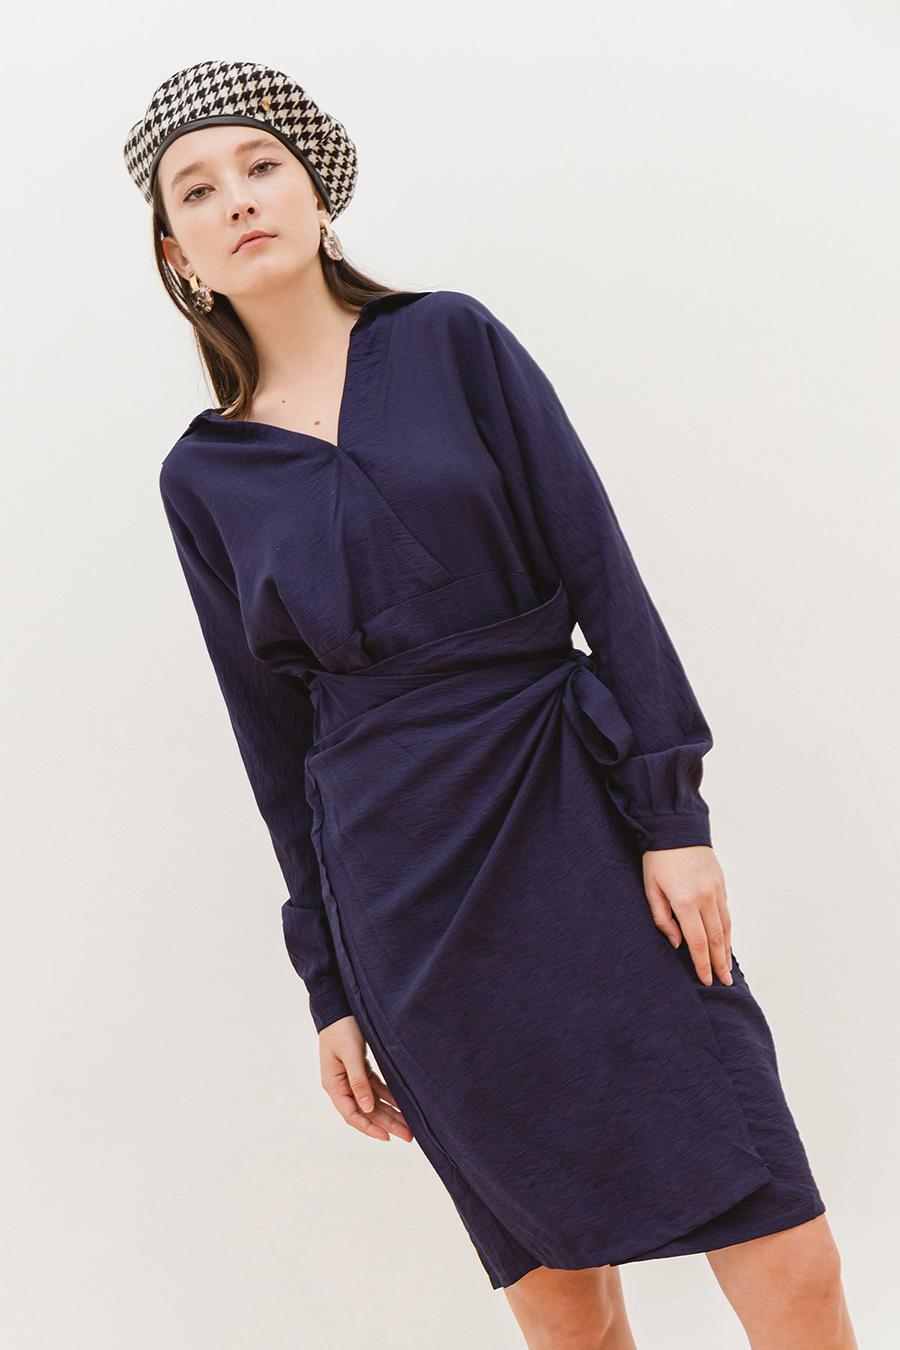 GENNARO DRESS - MIDNIGHT